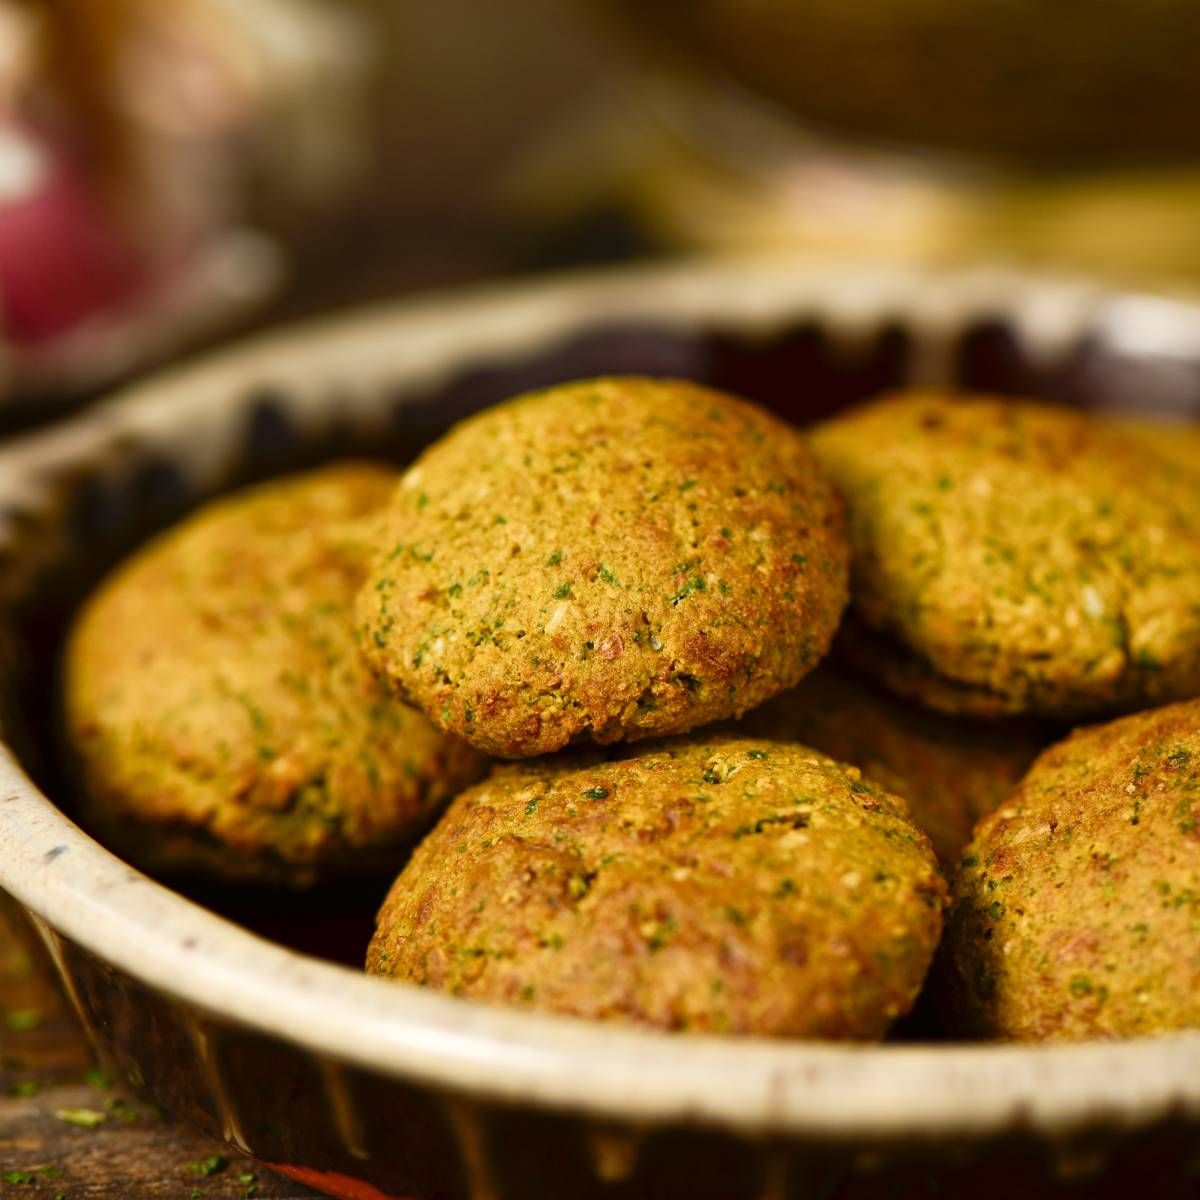 Tamiya Egyptian Fava Bean Fritters Recipe Recipe In 2021 Egyptian Food Recipes Fava Beans Recipes